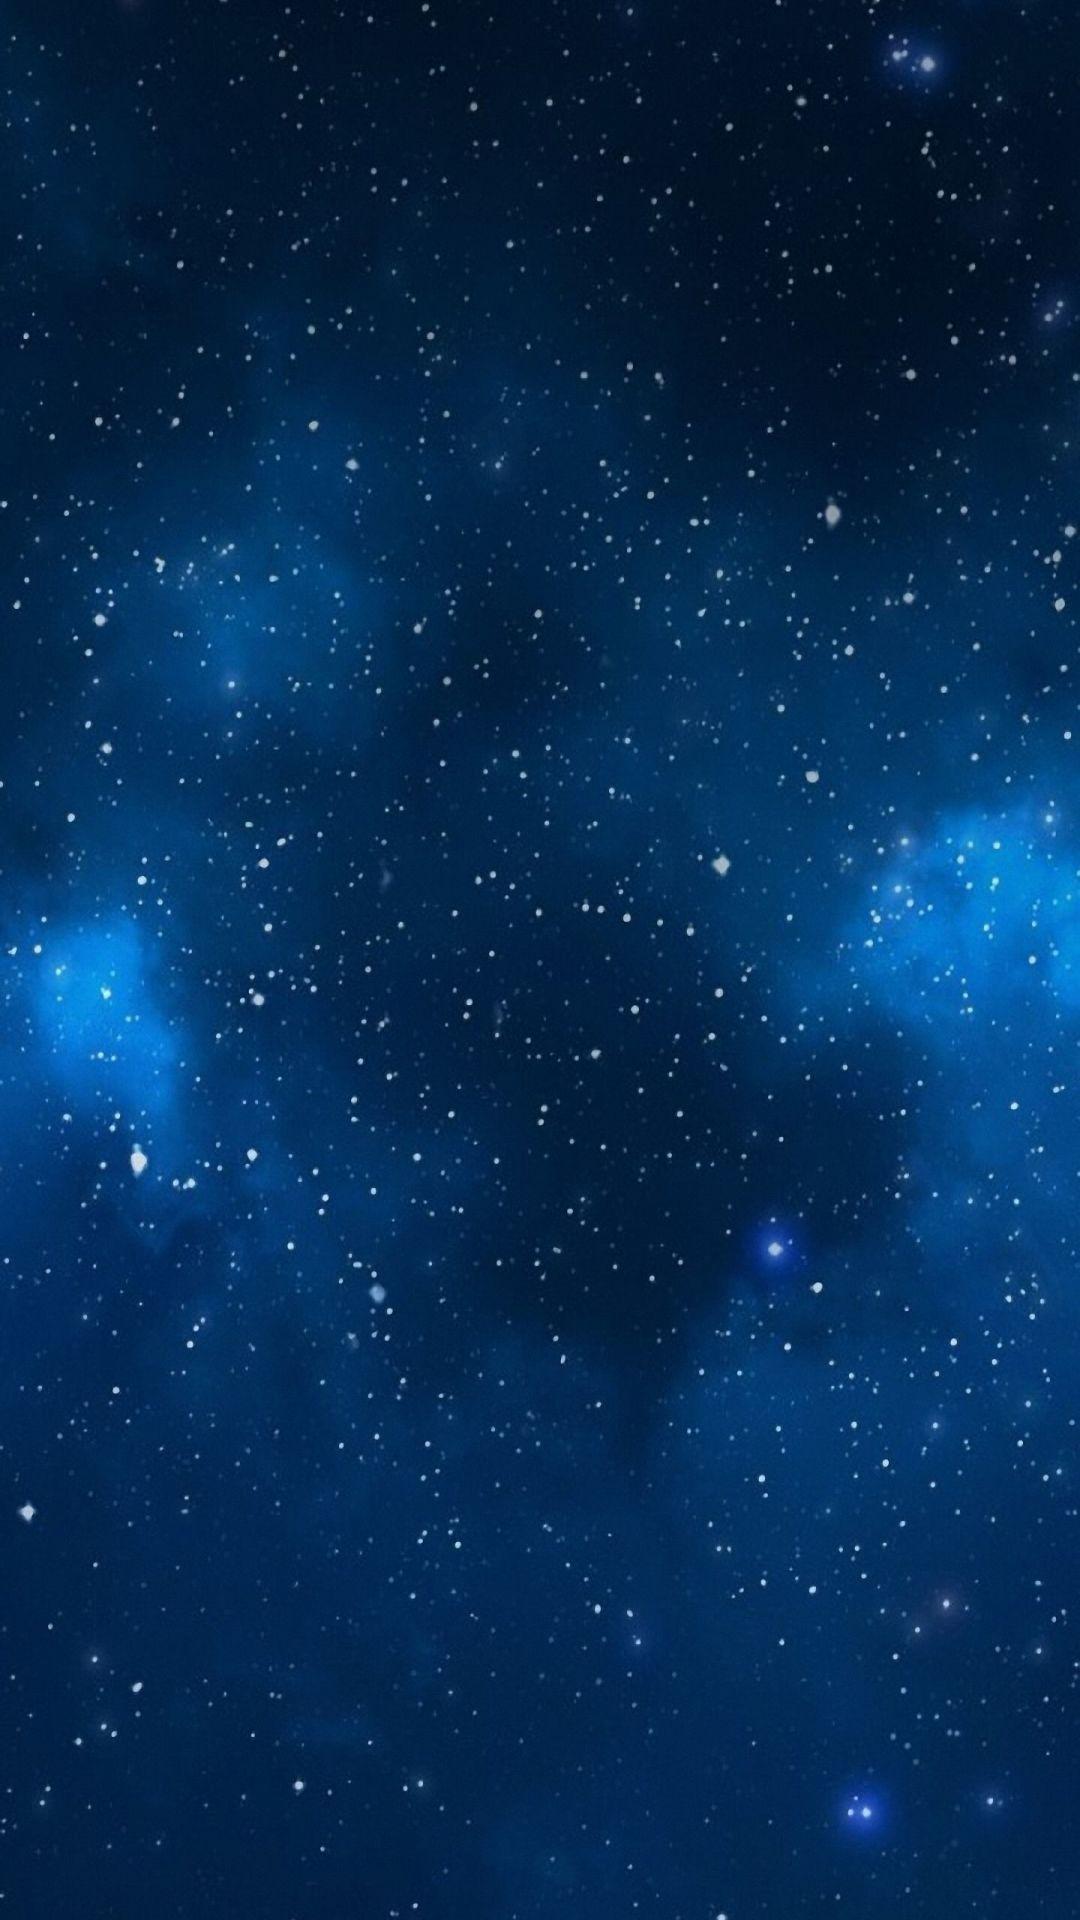 Aesthetic Dark Blue In 2020 Dark Aesthetic Colorful Wallpaper Wallpaper